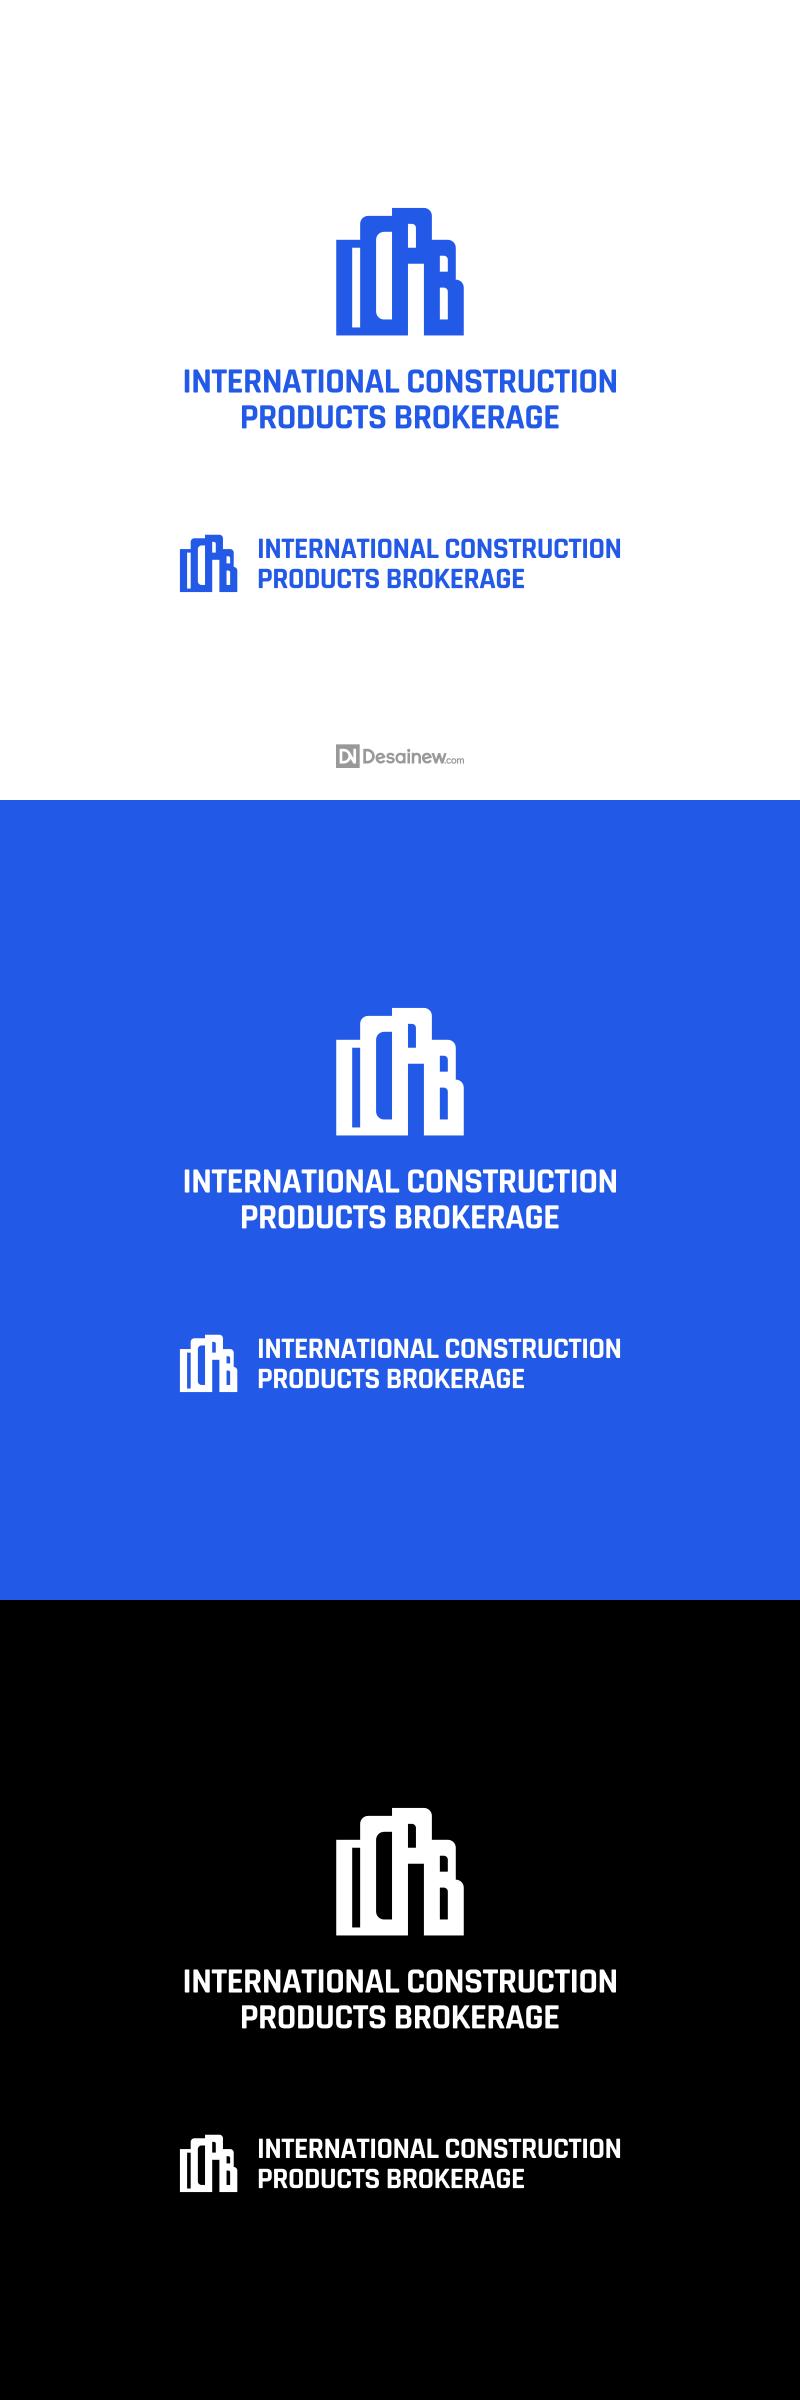 International Construction Products Brokerage Logo Design Project Portfolio Desainew Studio